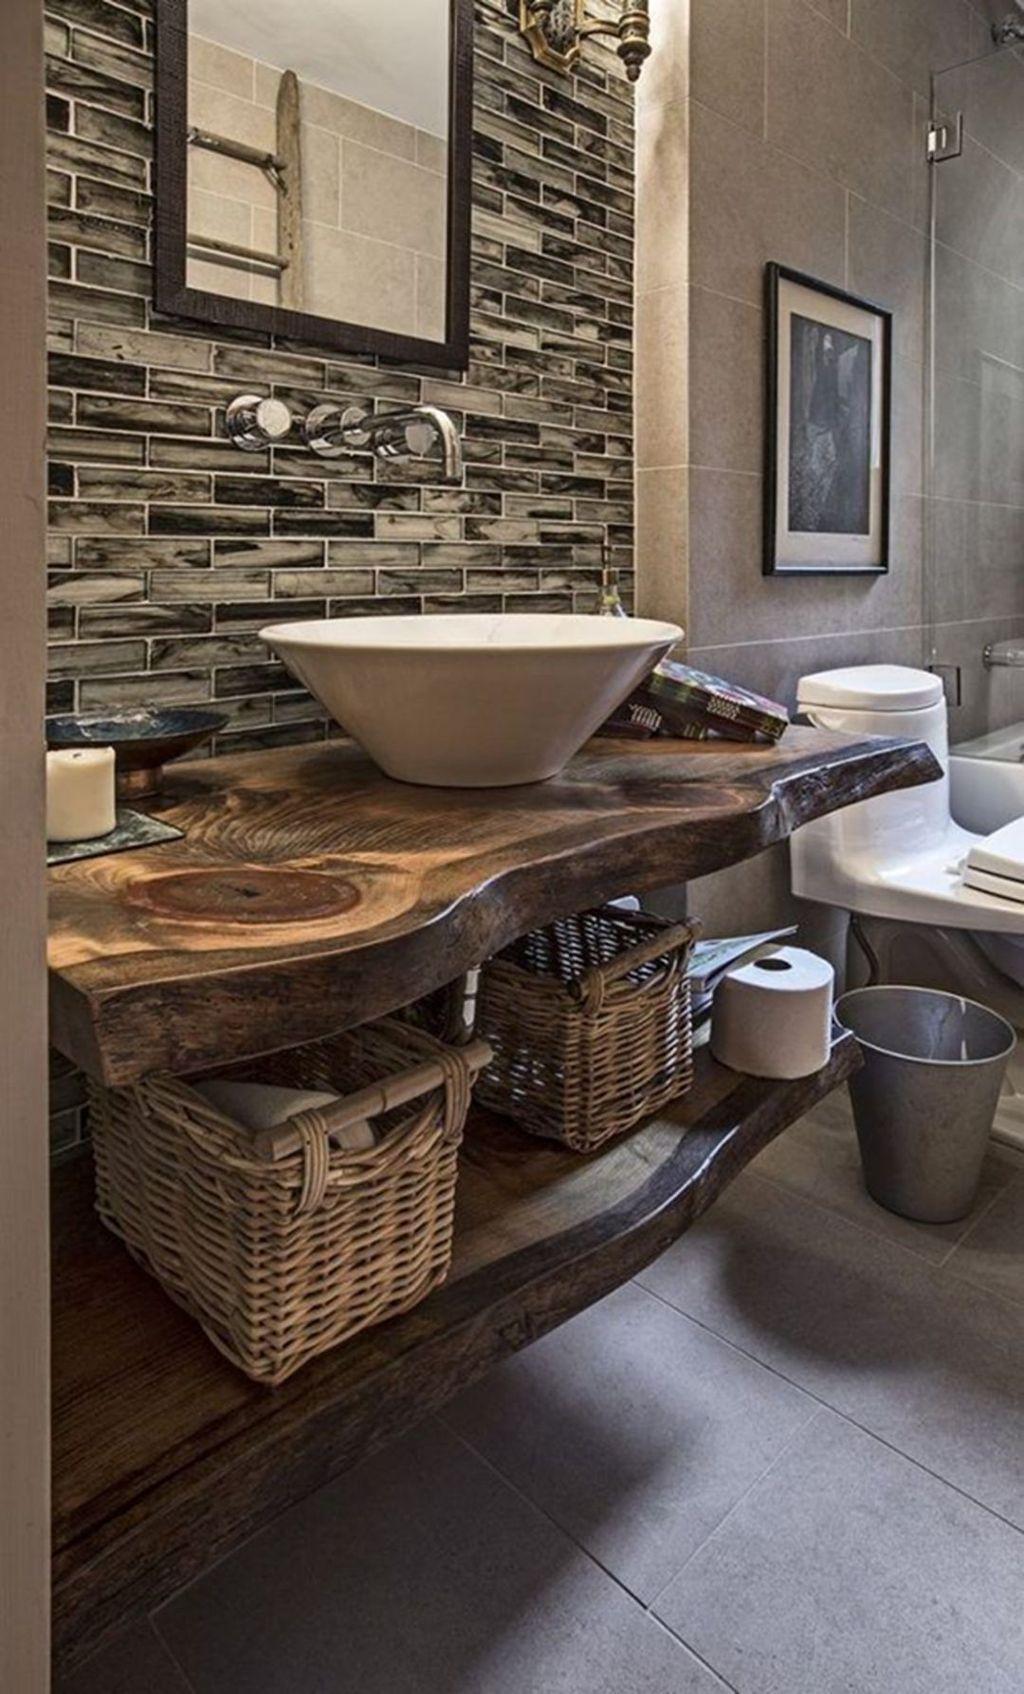 38 LoVely Rustic Bathroom Ideas #countertop